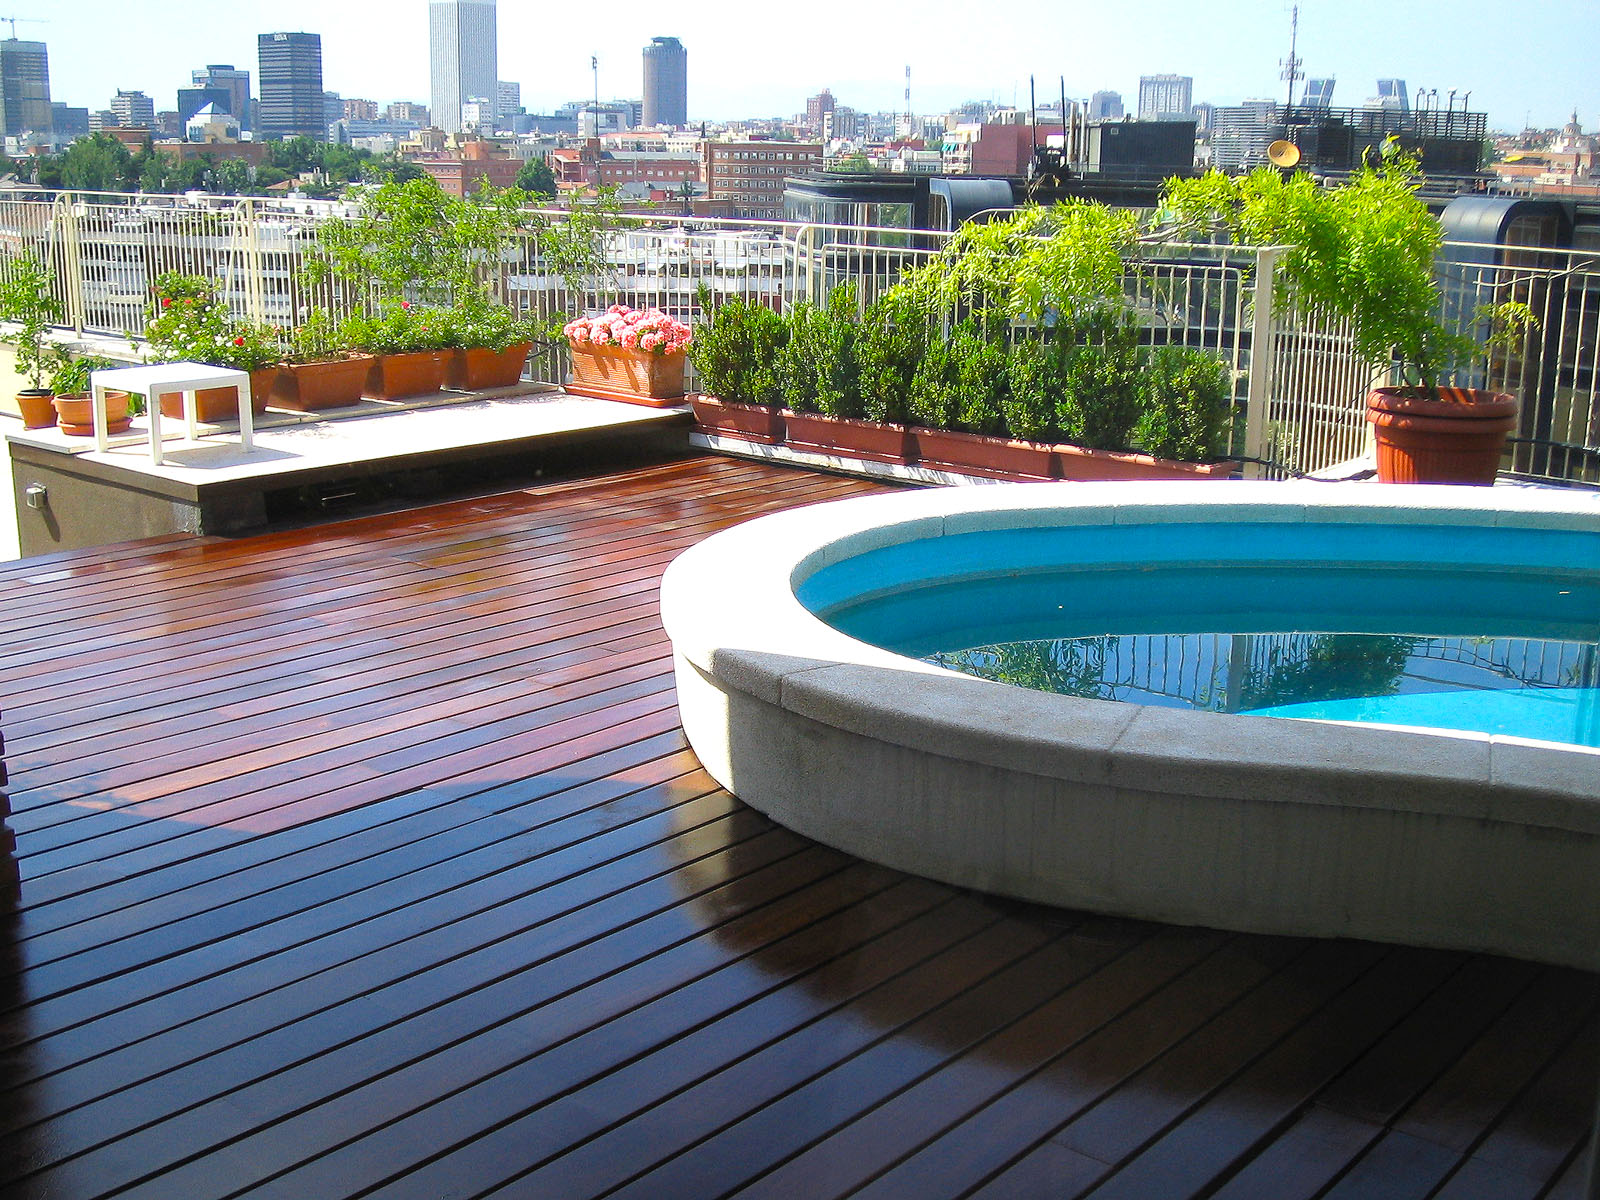 Terrazas exteriores piscinas y p rgolas mateca for Piscinas exteriores